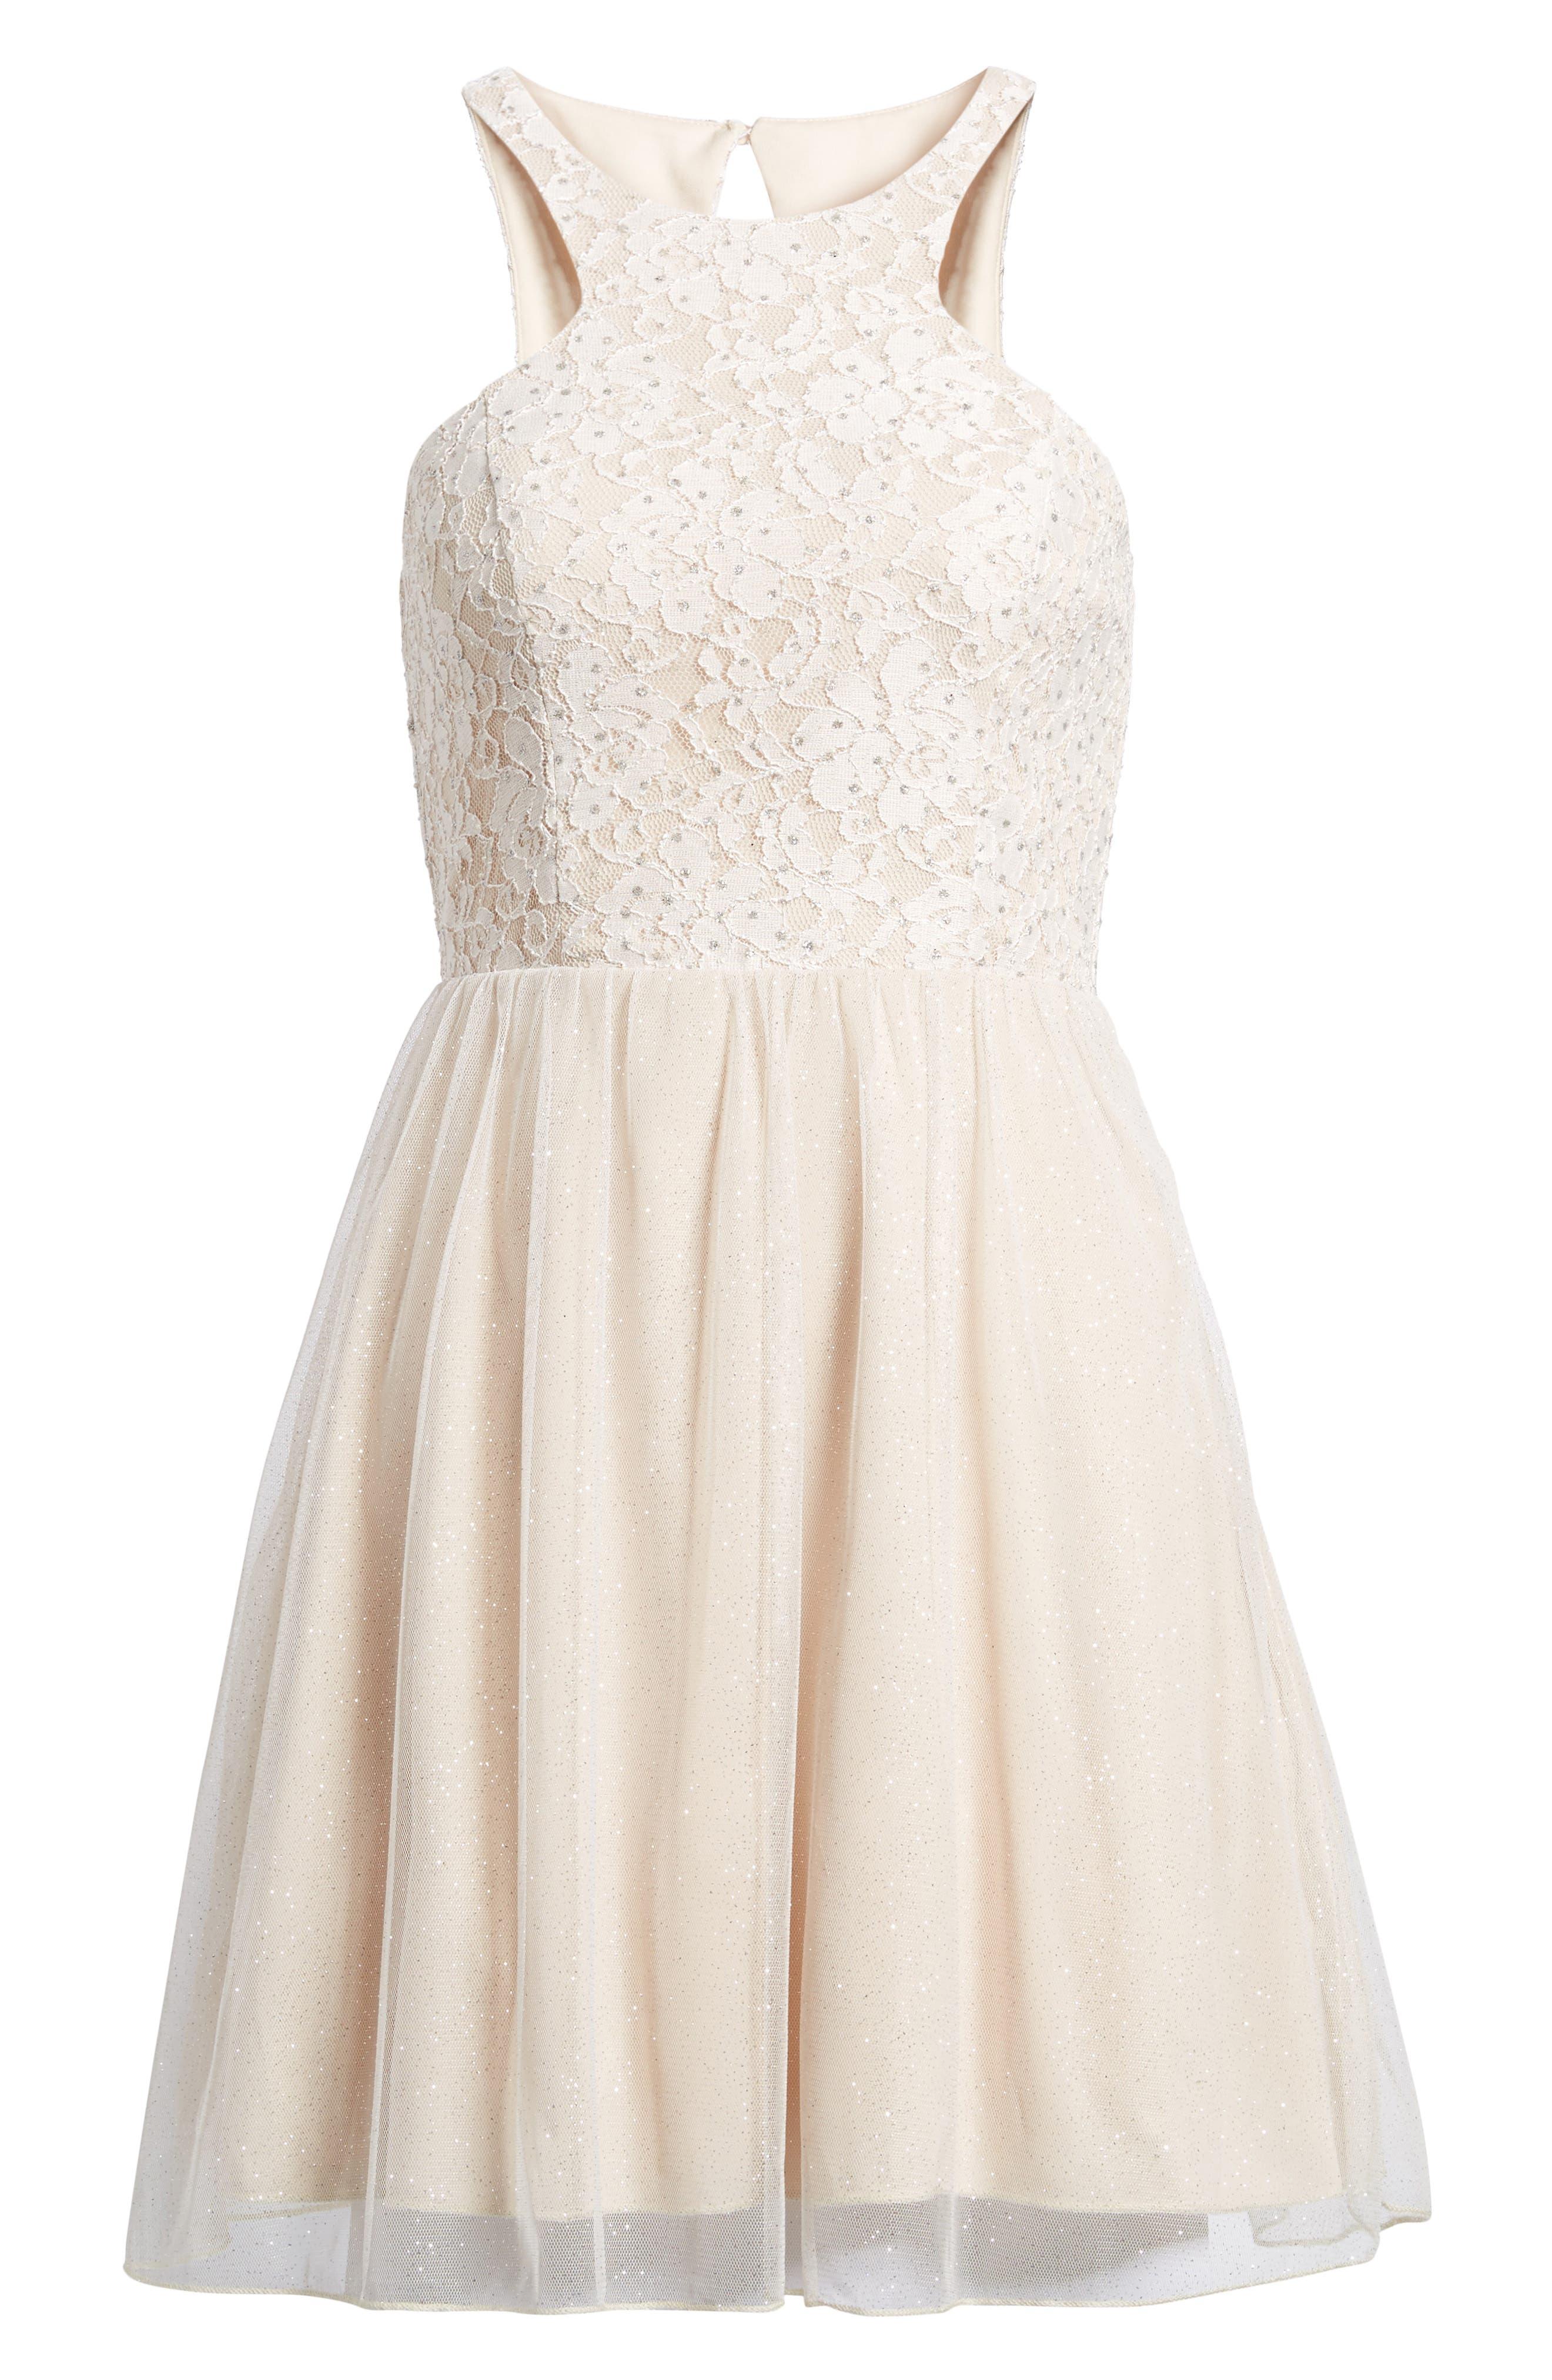 Glitter Tulle Dress,                             Alternate thumbnail 6, color,                             Blush